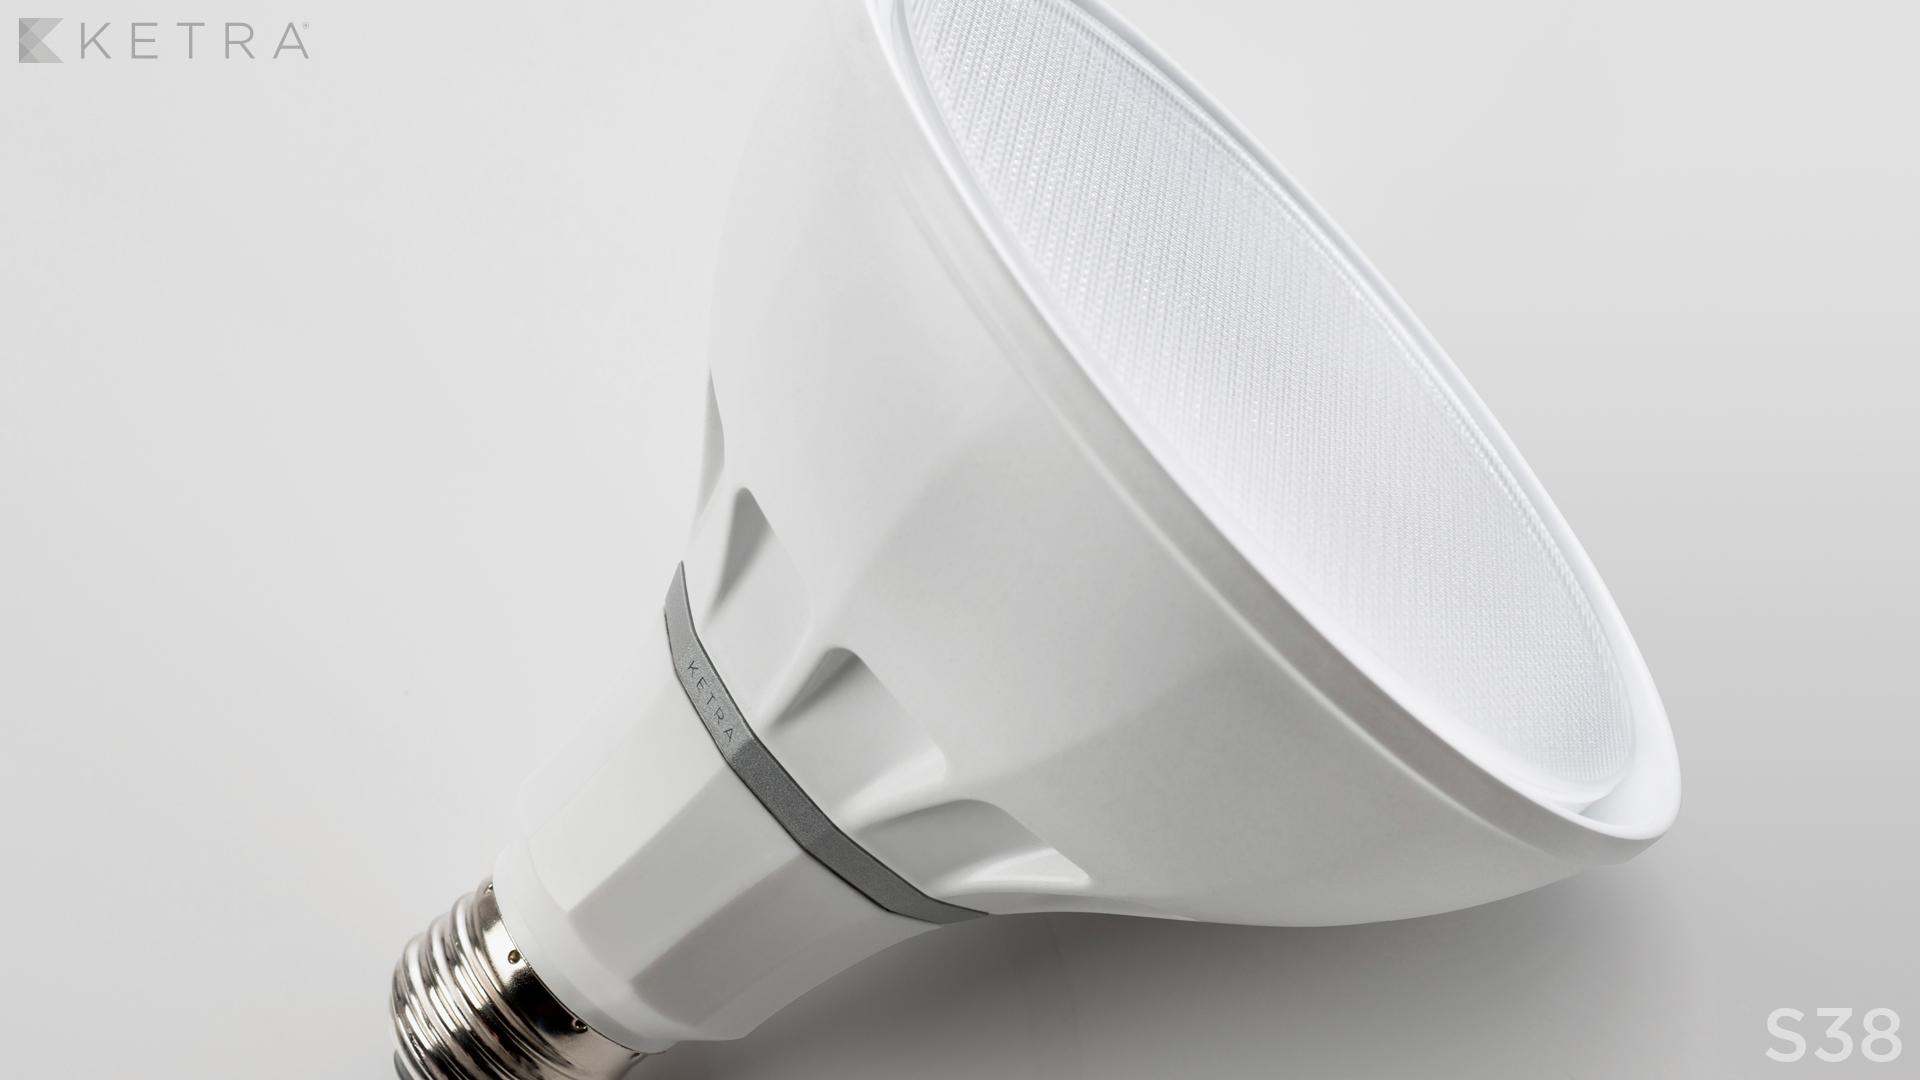 A Ketra Par30 light bulb.